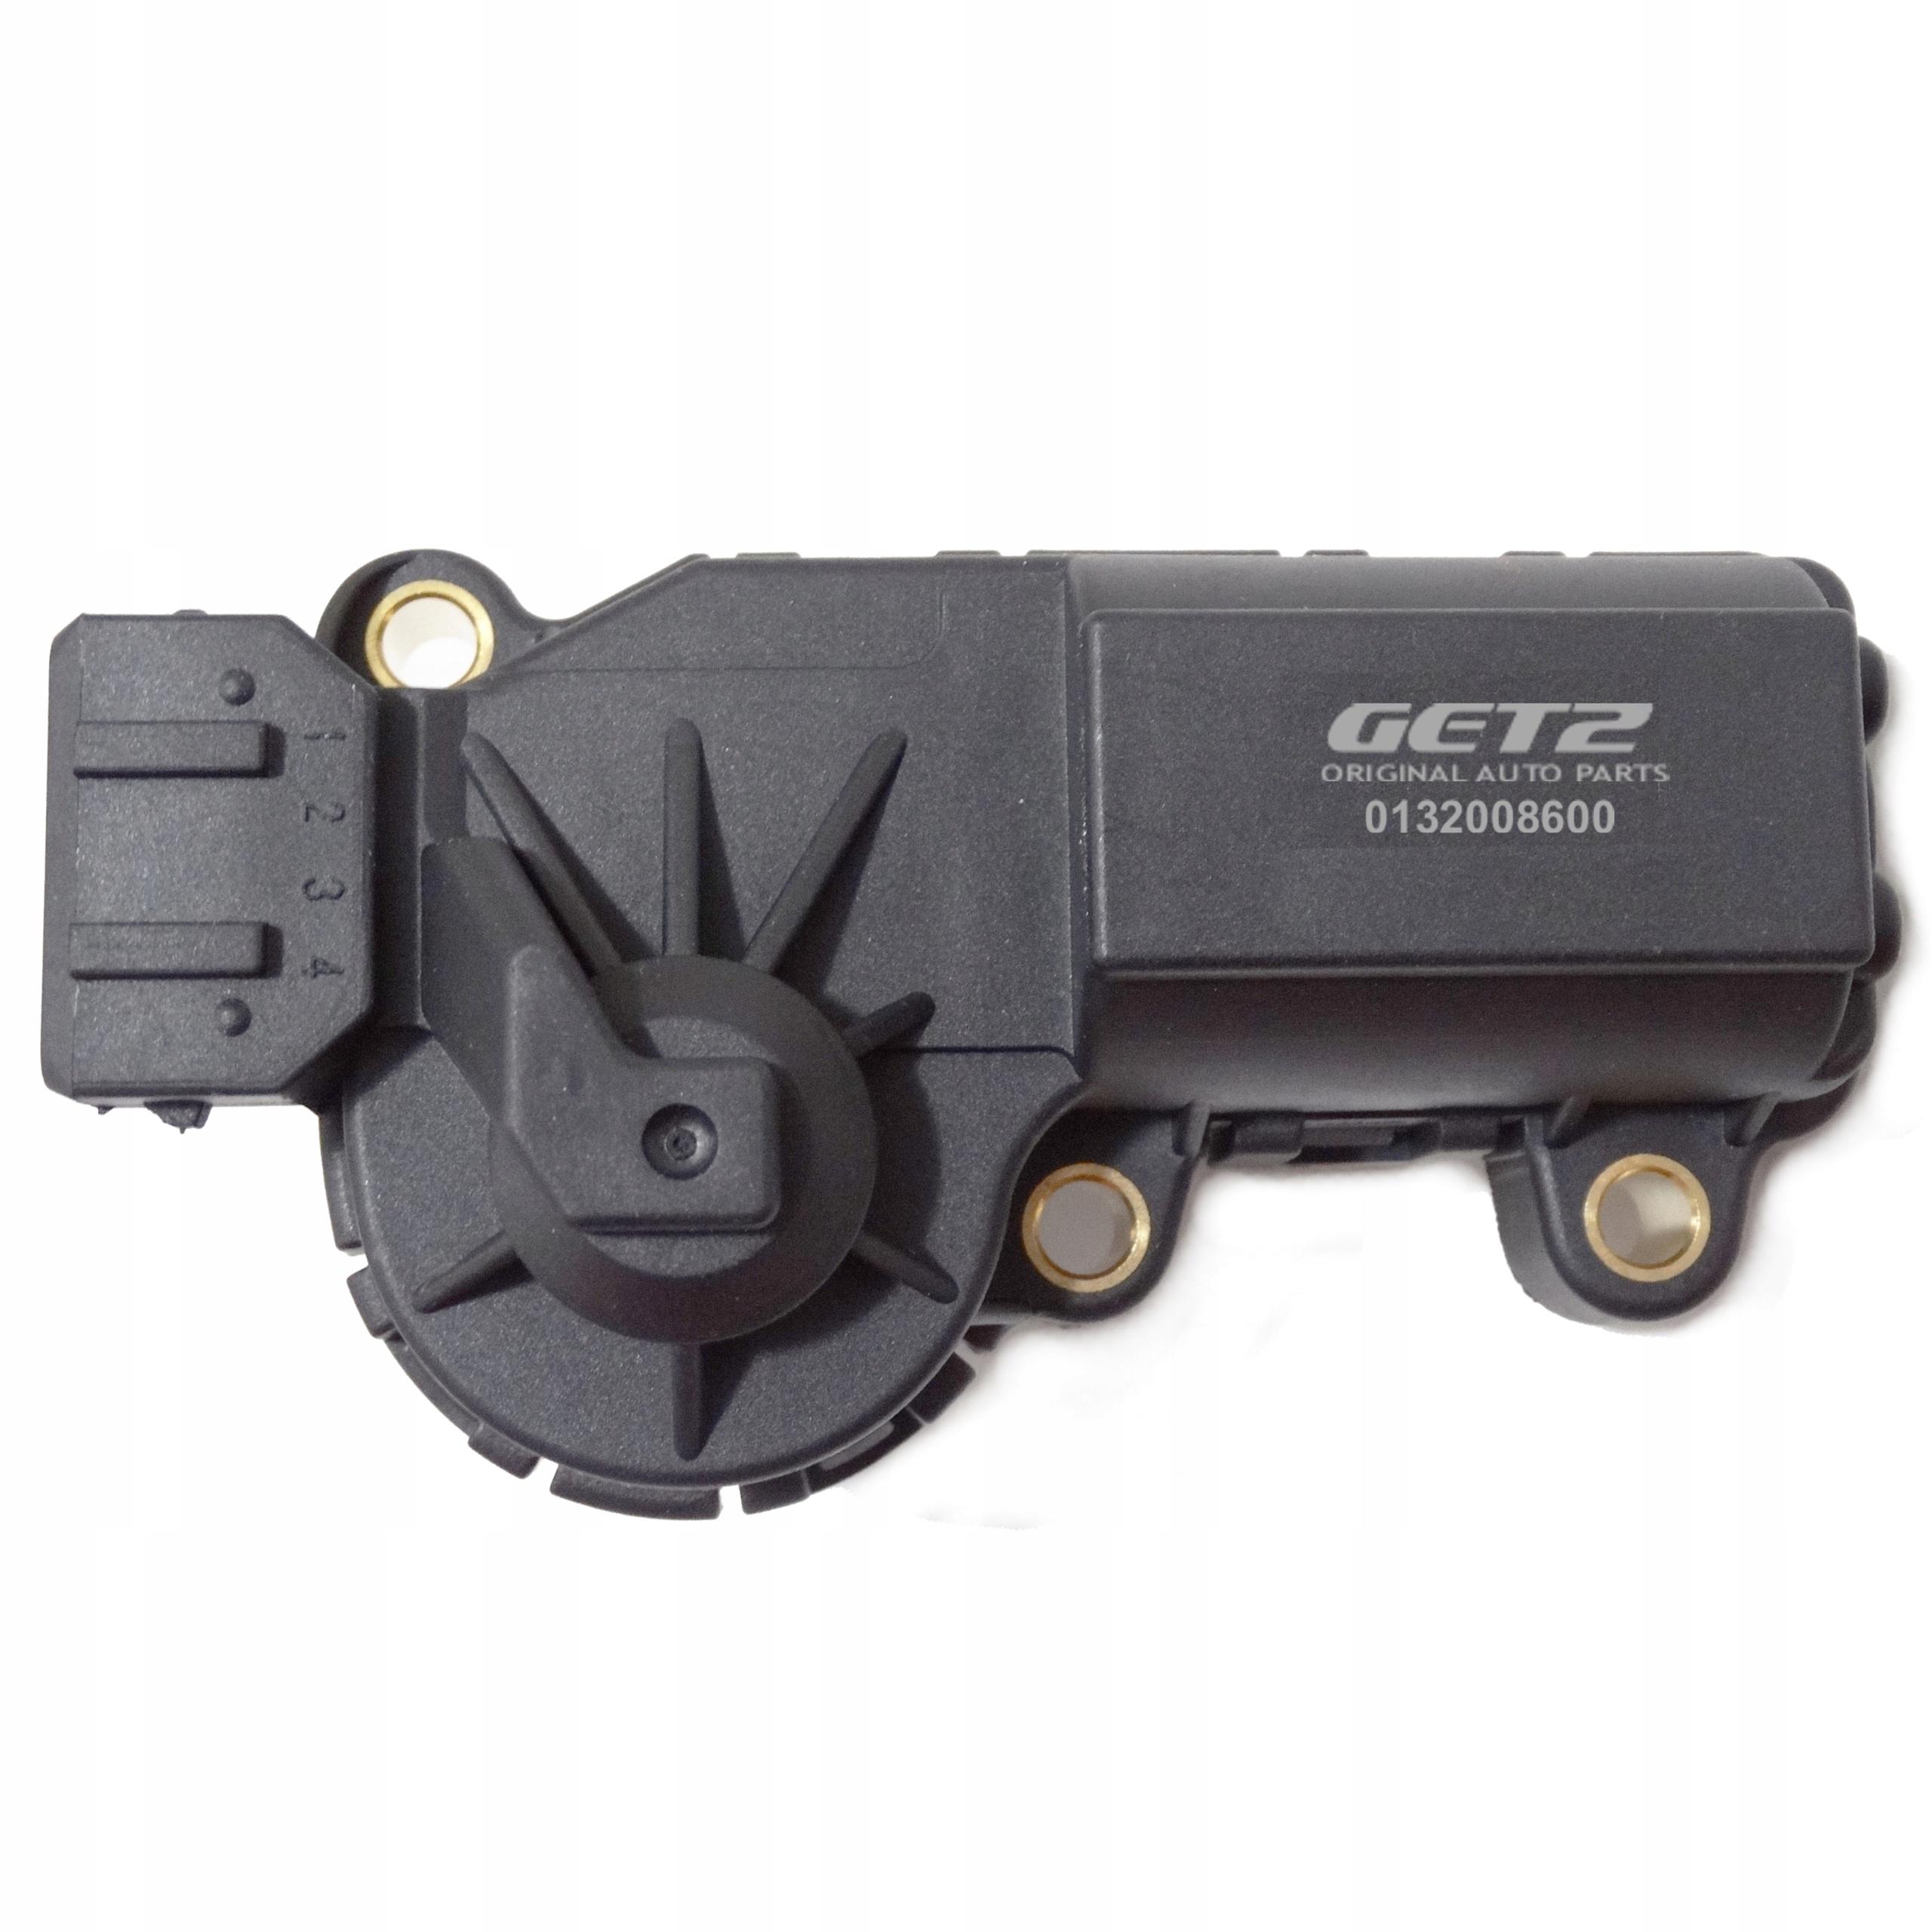 двигатель шаговый opel astra corsa b 10 12 12v